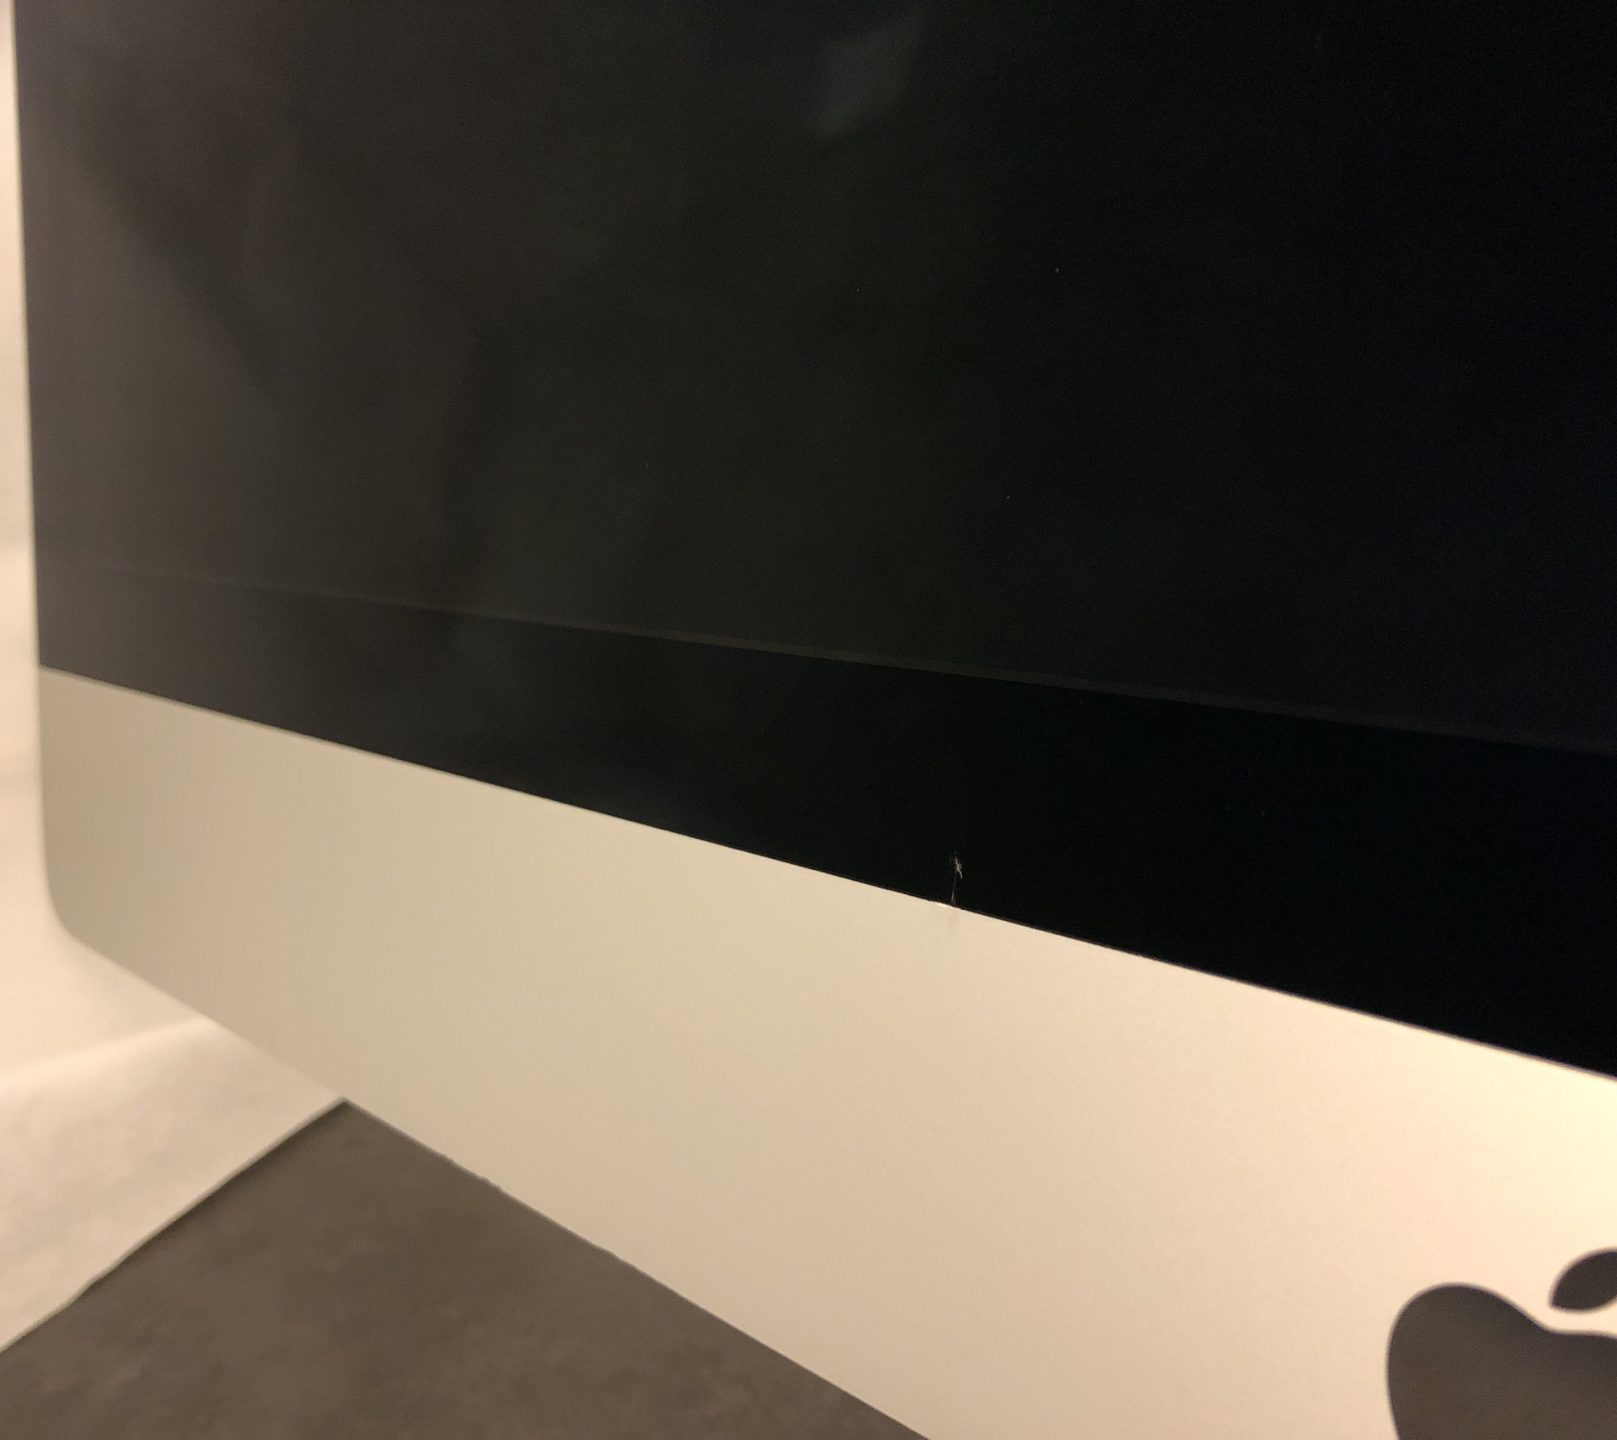 "iMac 27"" Retina 5K Late 2015 (Intel Quad-Core i5 3.2 GHz 8 GB RAM 1 TB HDD), Intel Quad-Core i5 3.2 GHz, 8 GB RAM, 1 TB HDD, bild 3"